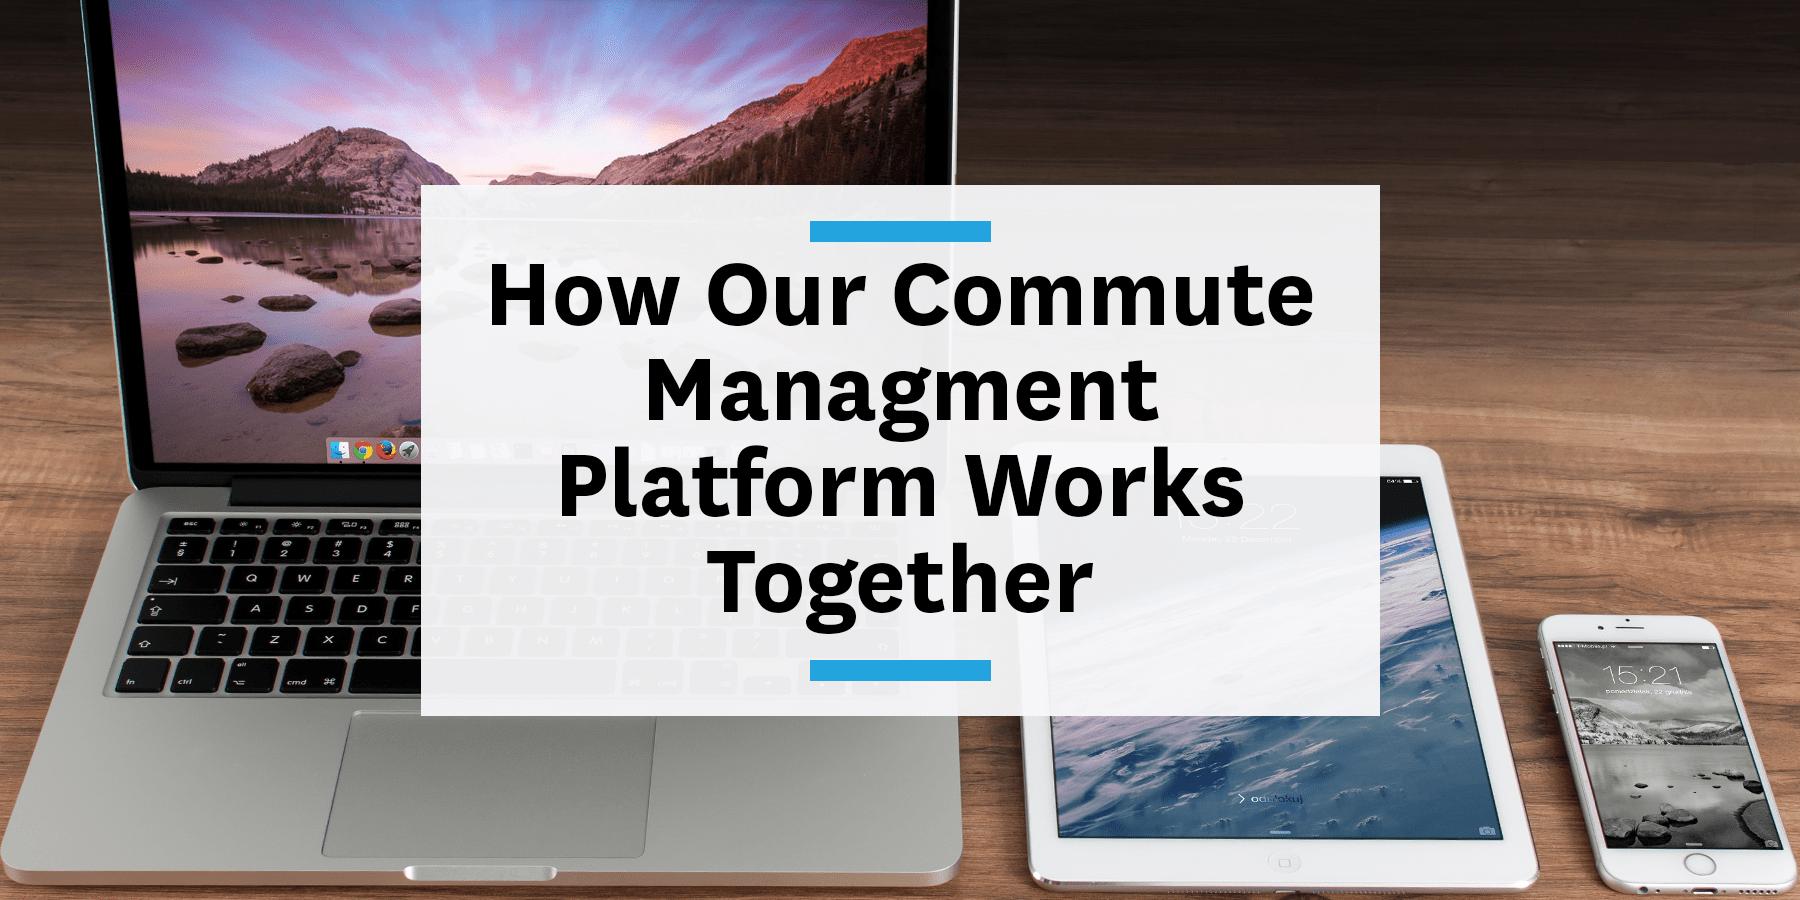 image representing TransitScreen's commute management platform